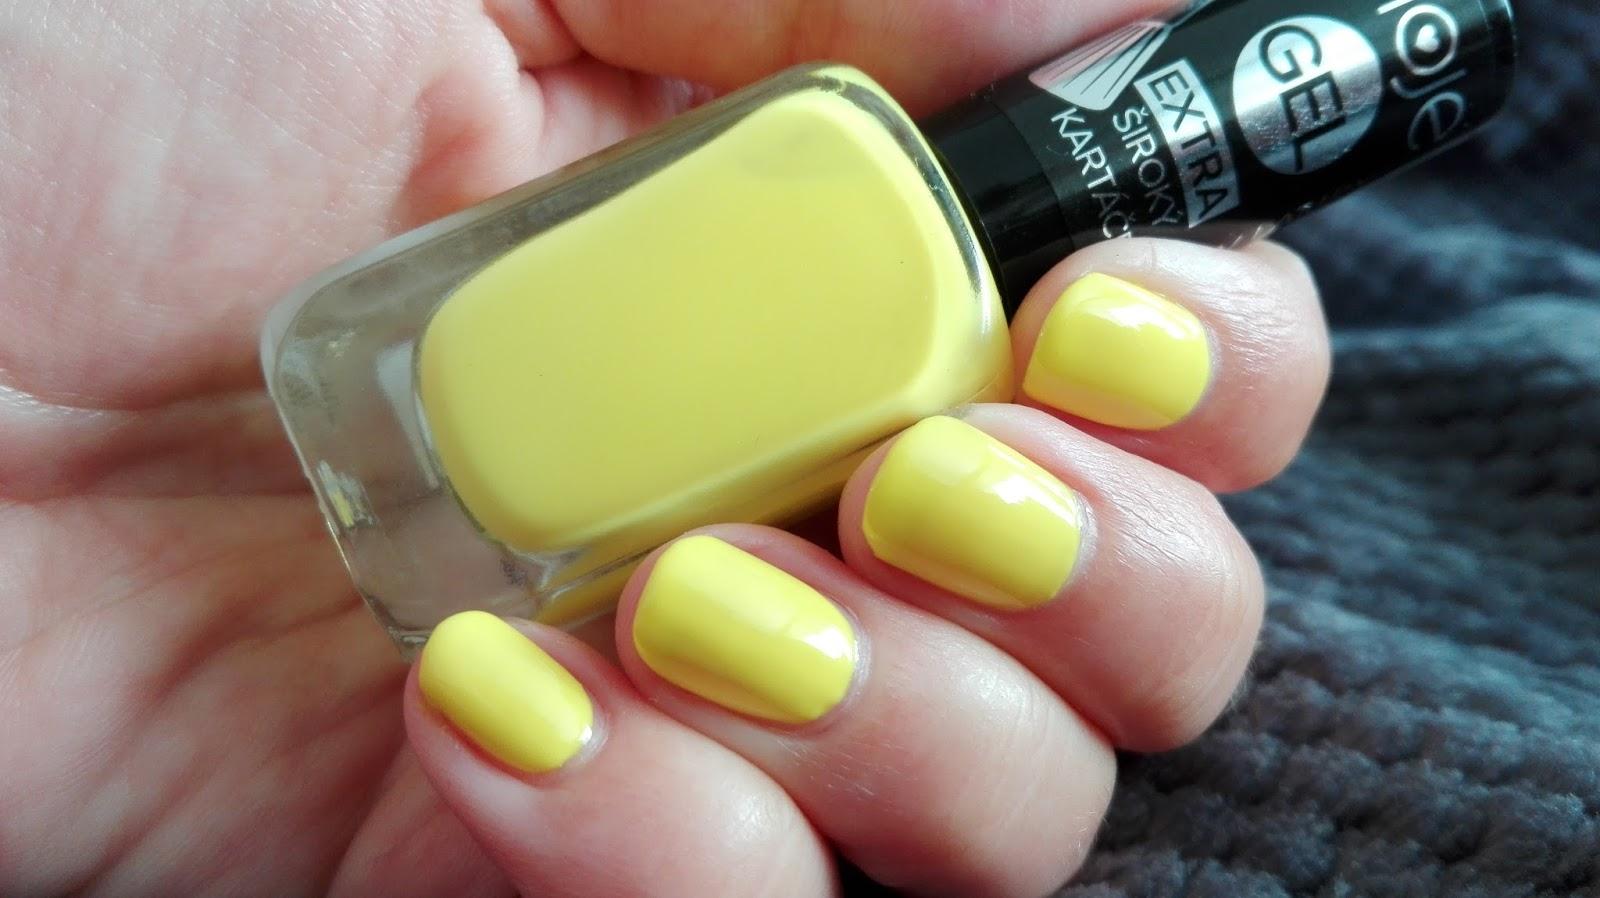 Kosmetika Moje Gelove Laky 12 13 Blogerky Cz